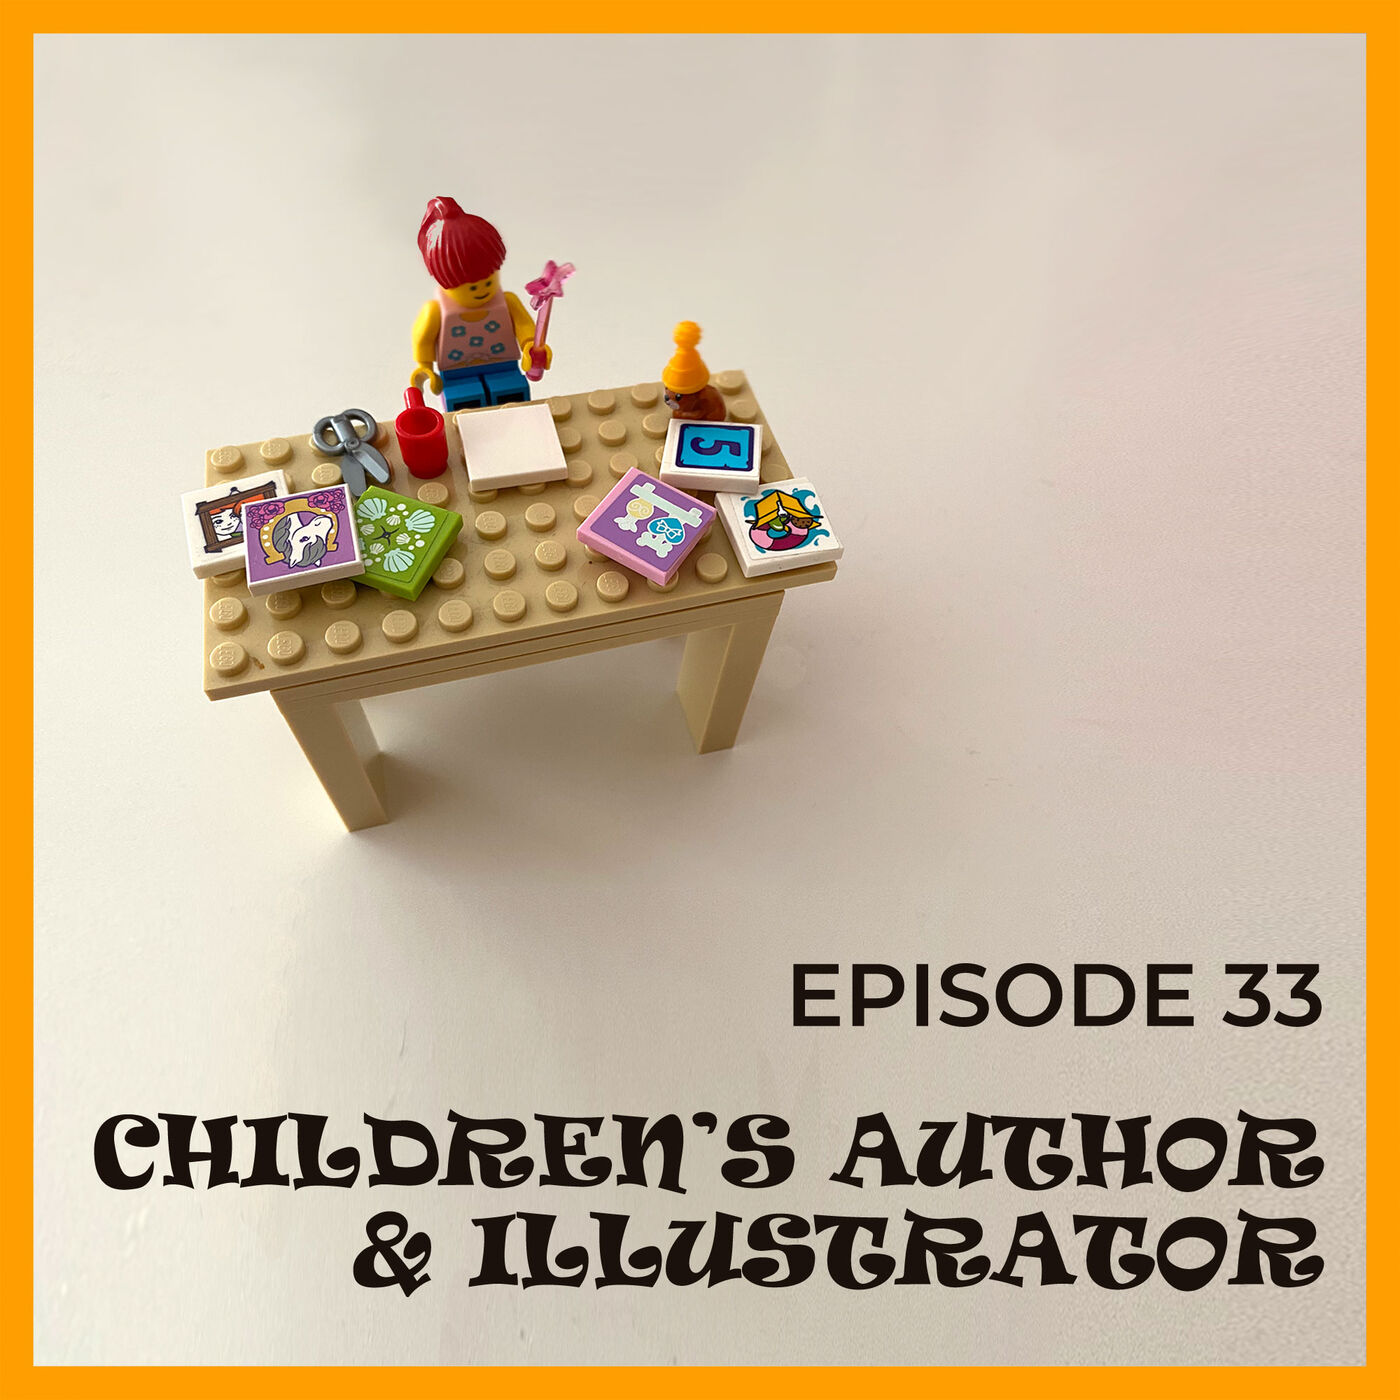 The Children's Author & Illustrator